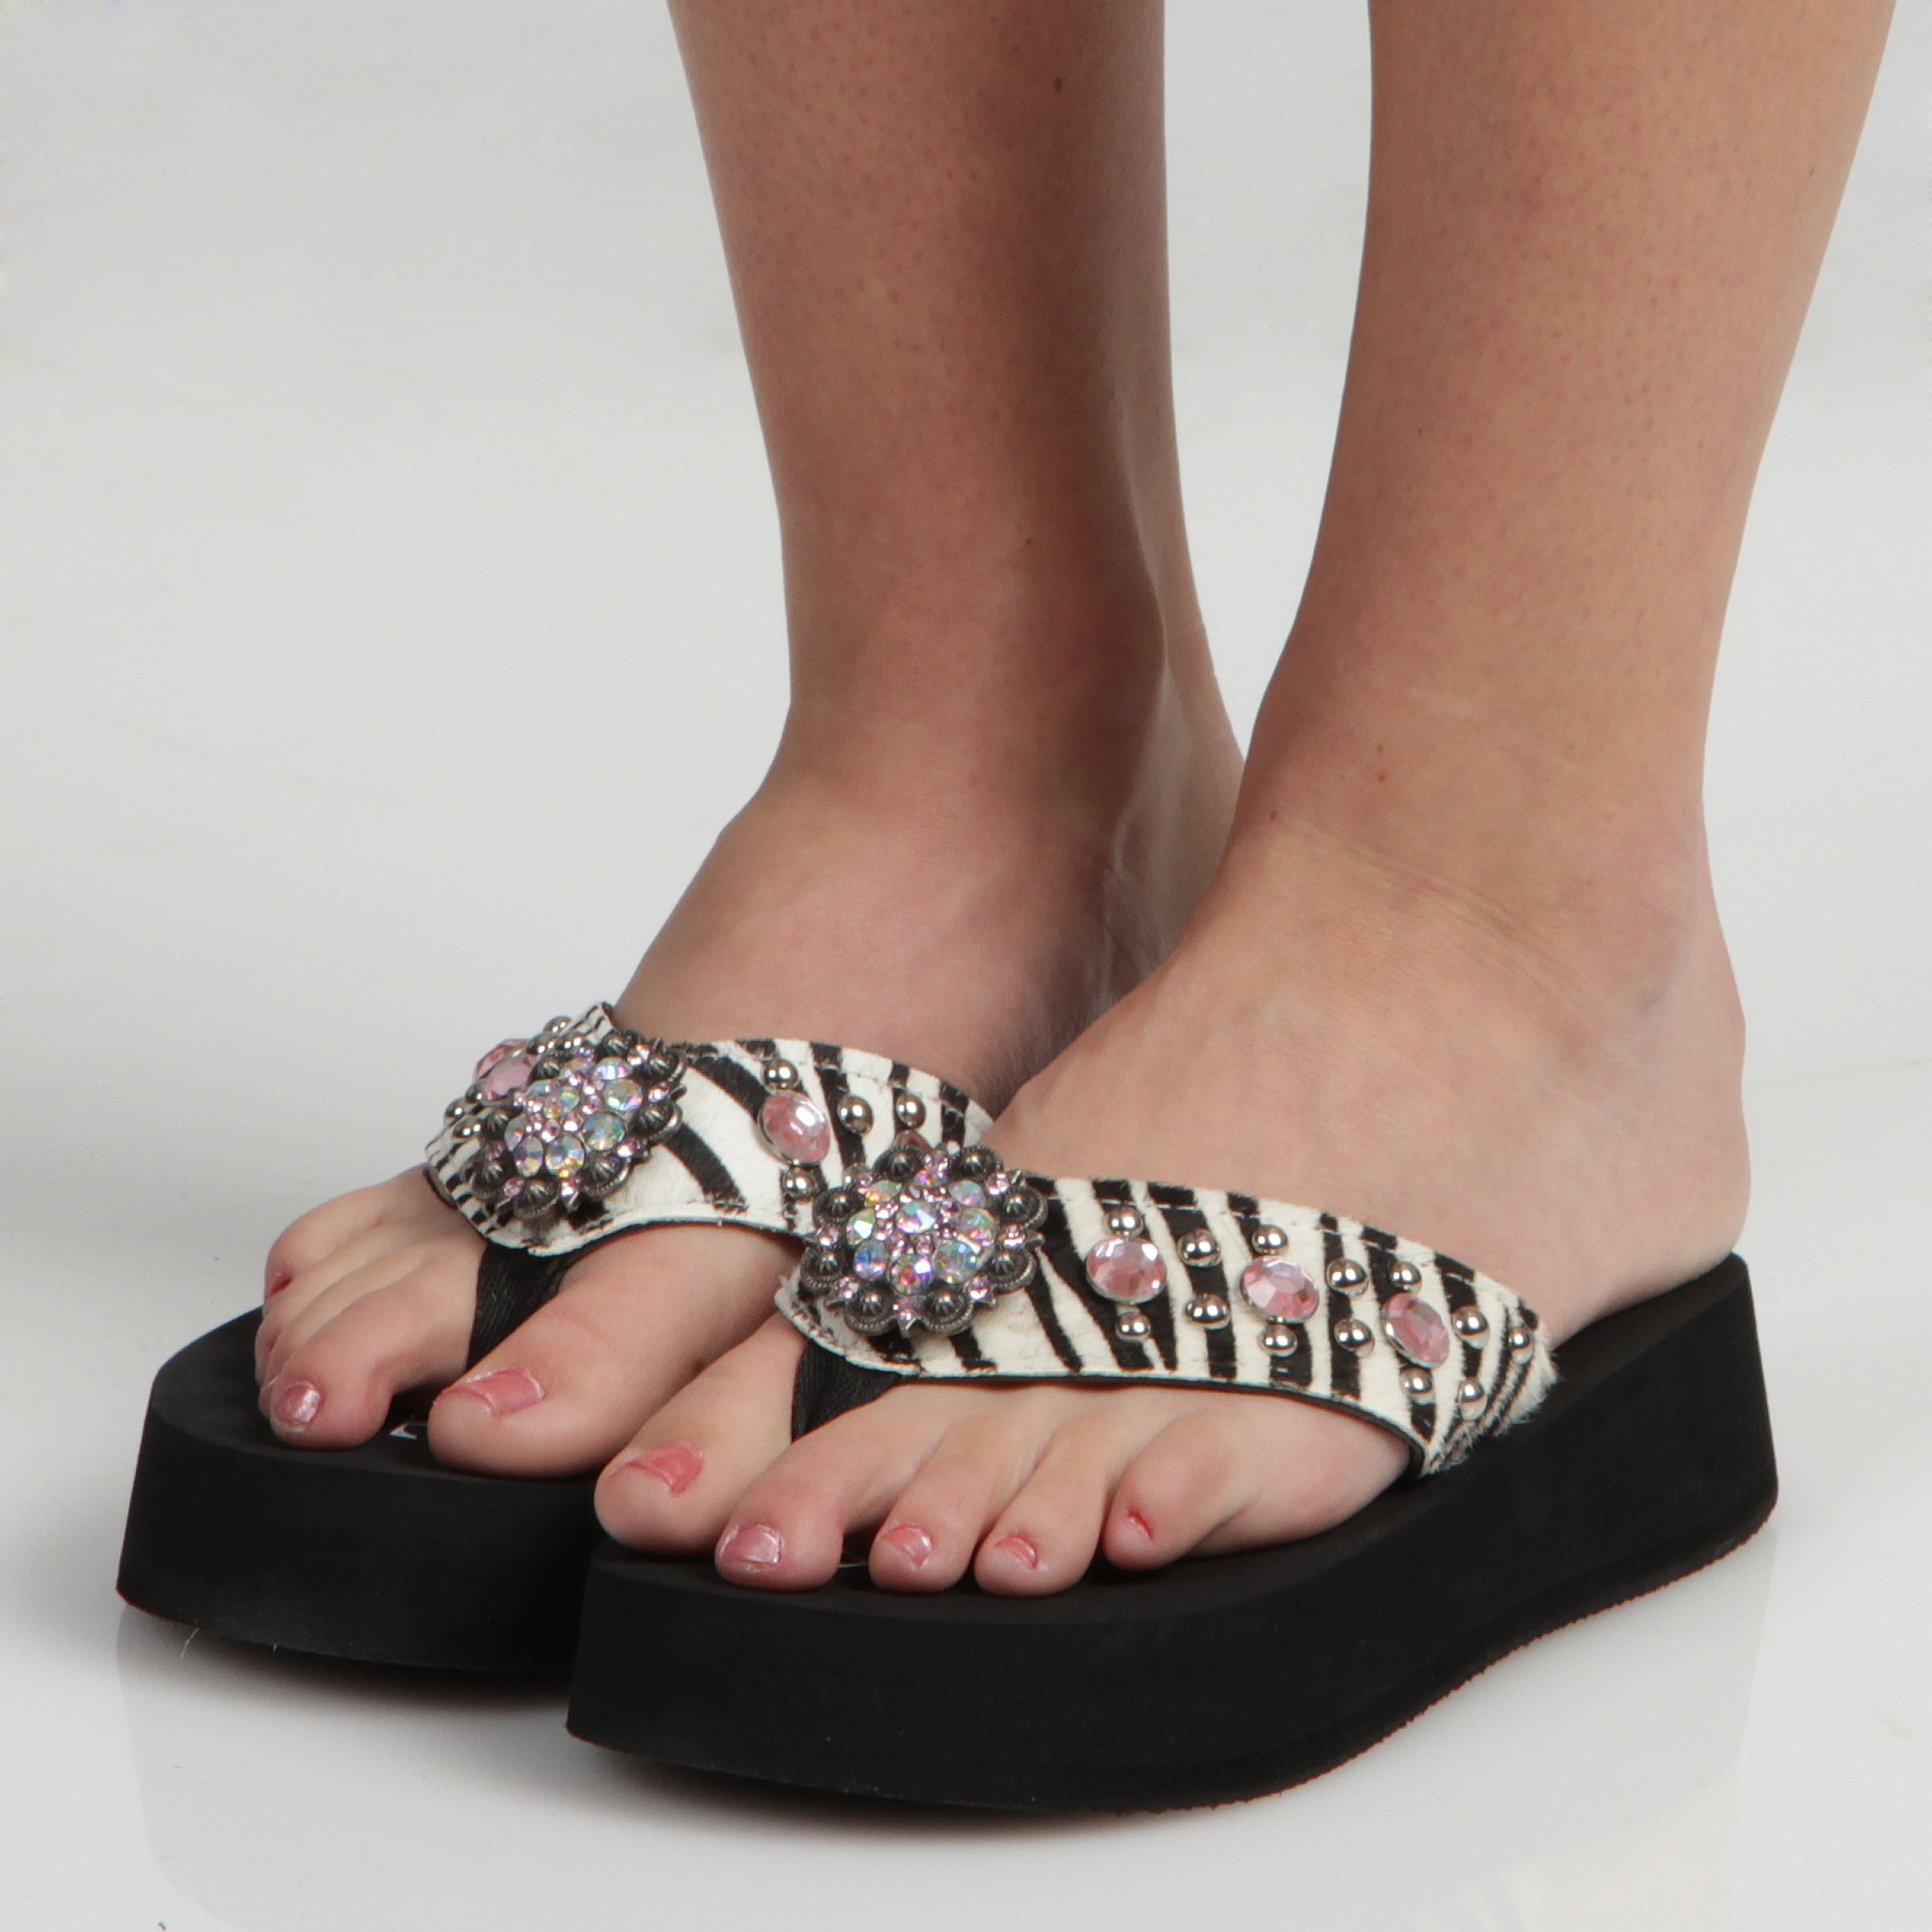 7dd7272f8 Shop Hidden Sole Women s Black Zebra Rhinestone Flip Flops - Free Shipping  Today - Overstock - 6602221